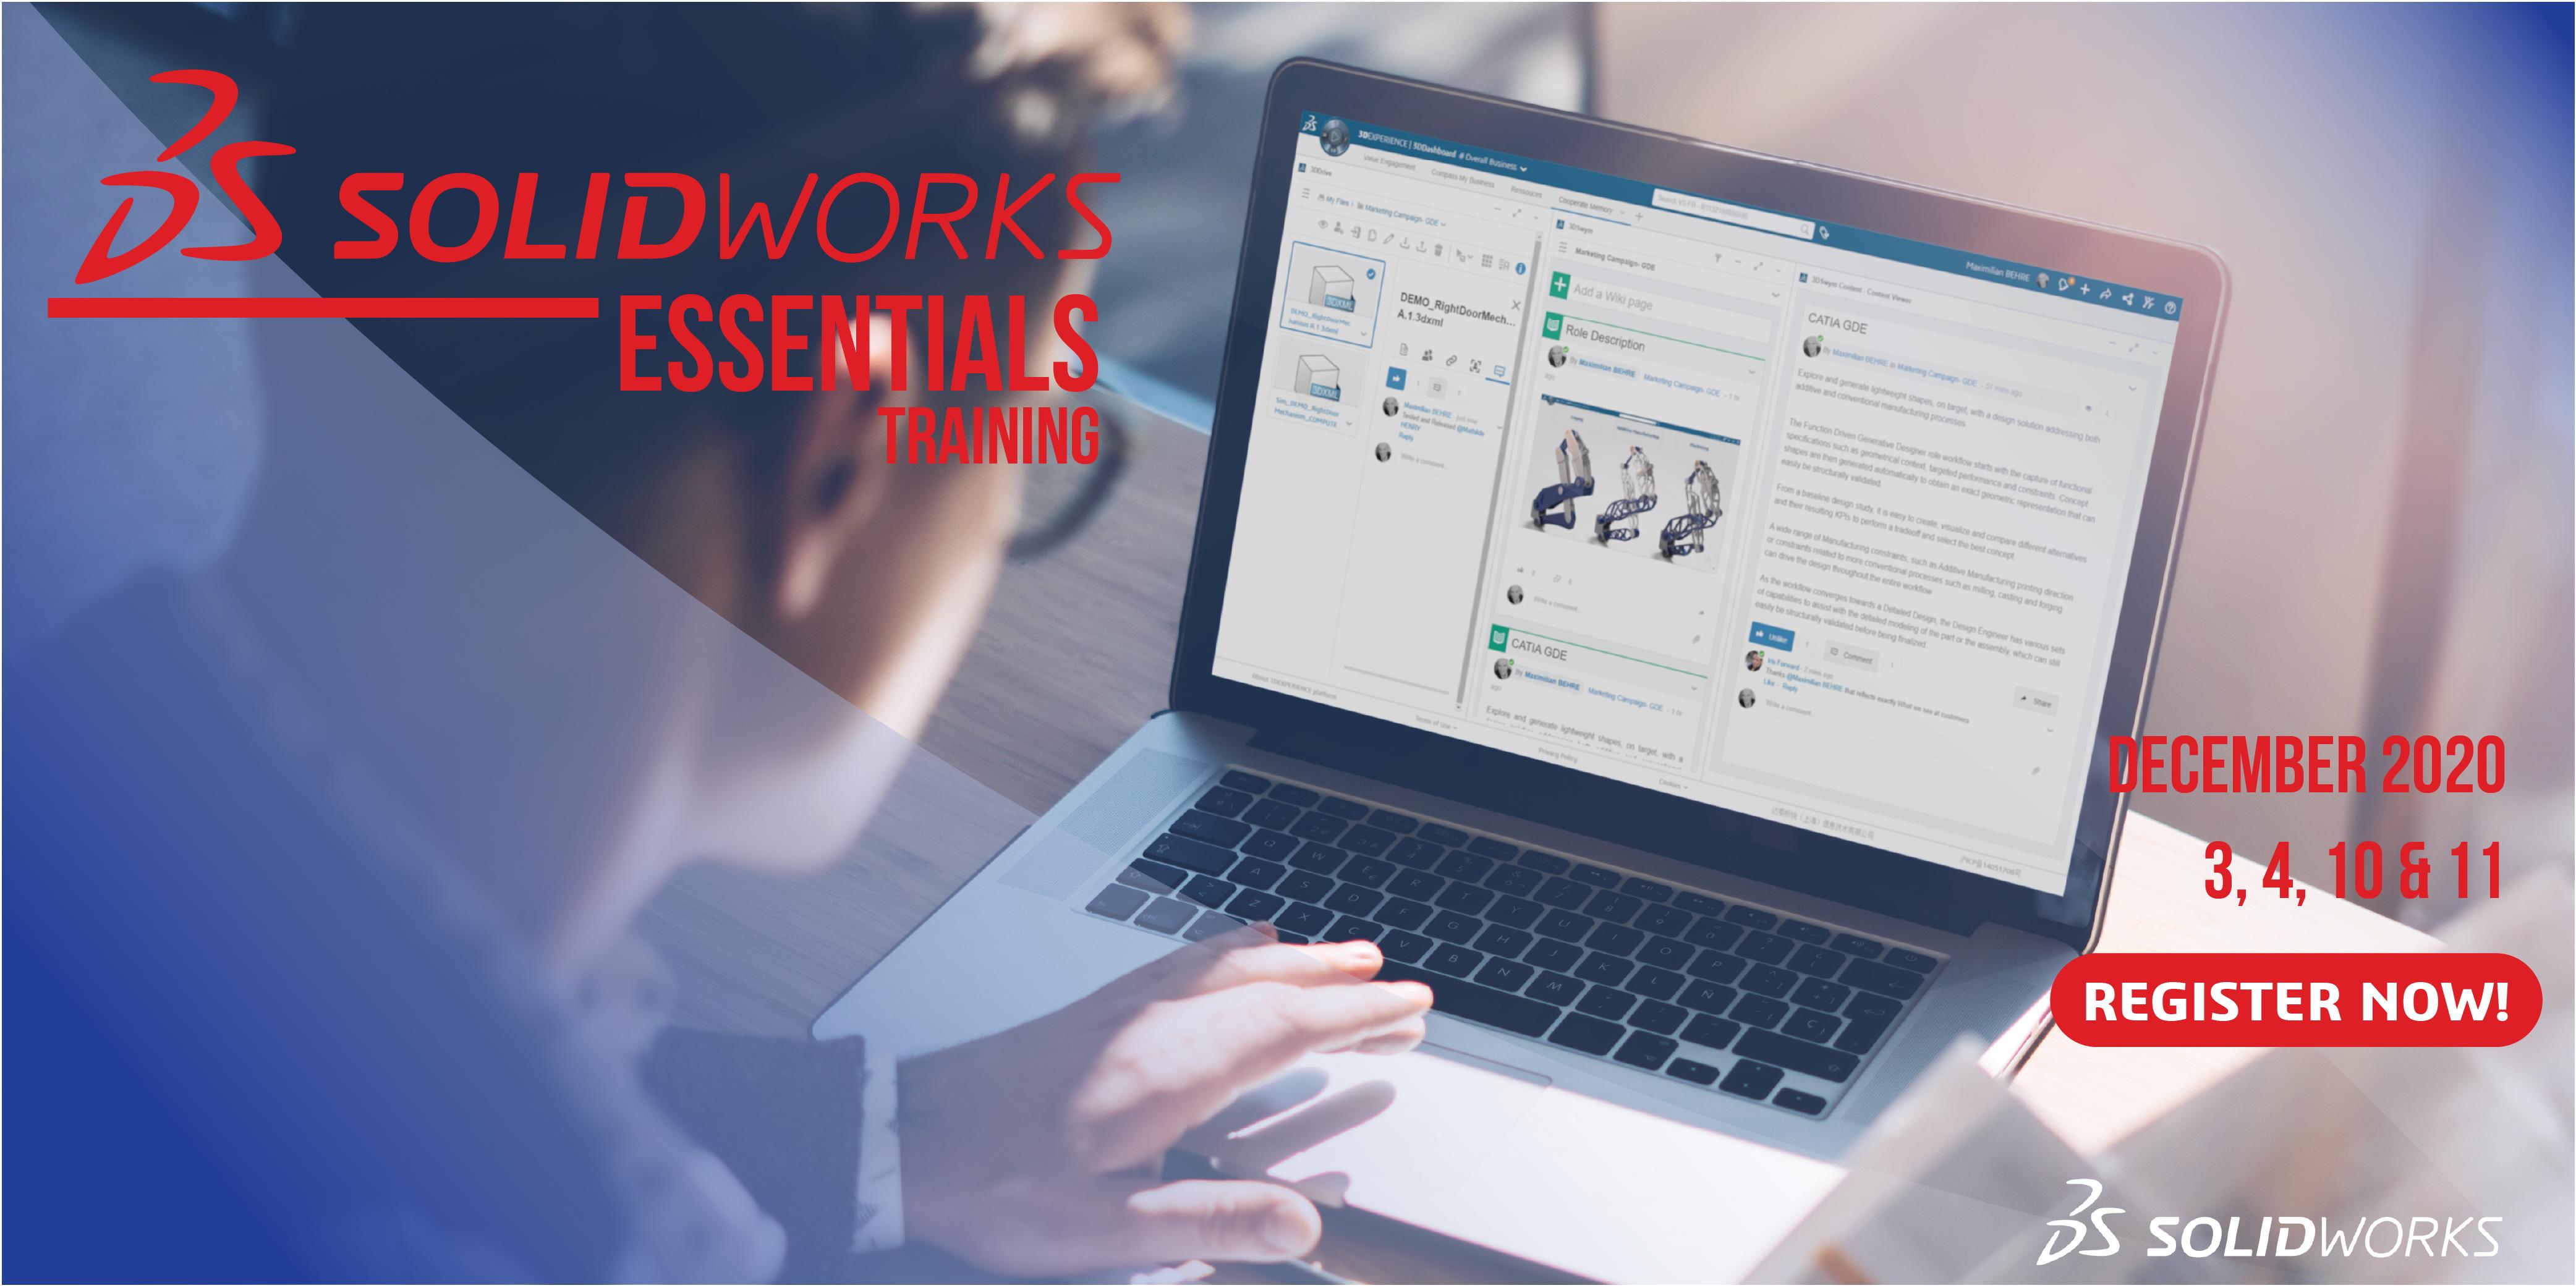 Copy Of Copy Of Solidworks Essentials Training 3 Dec 2020